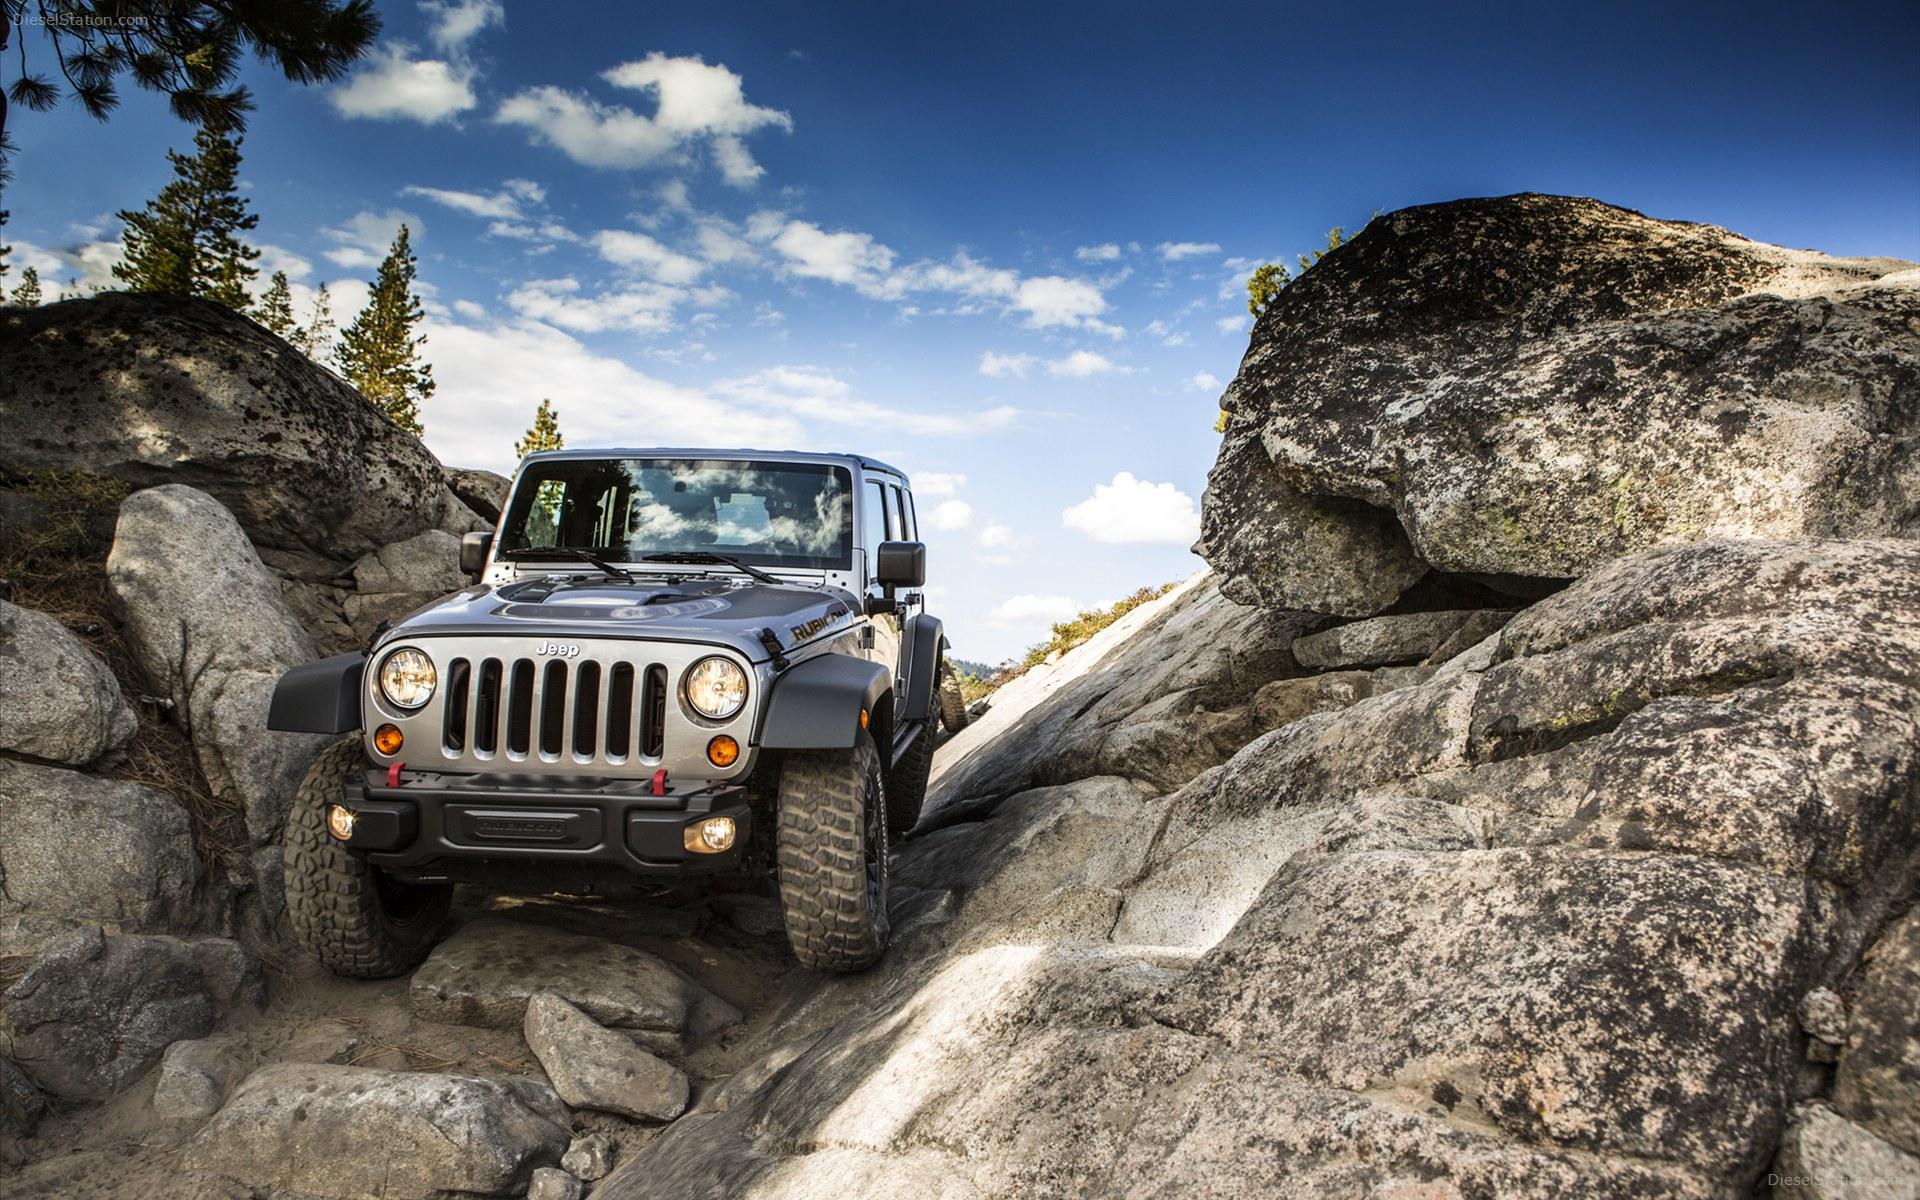 Hd wallpaper jeep - Jeep Wrangler Rubicon Desktop Hd Wallpaper 5 Cars